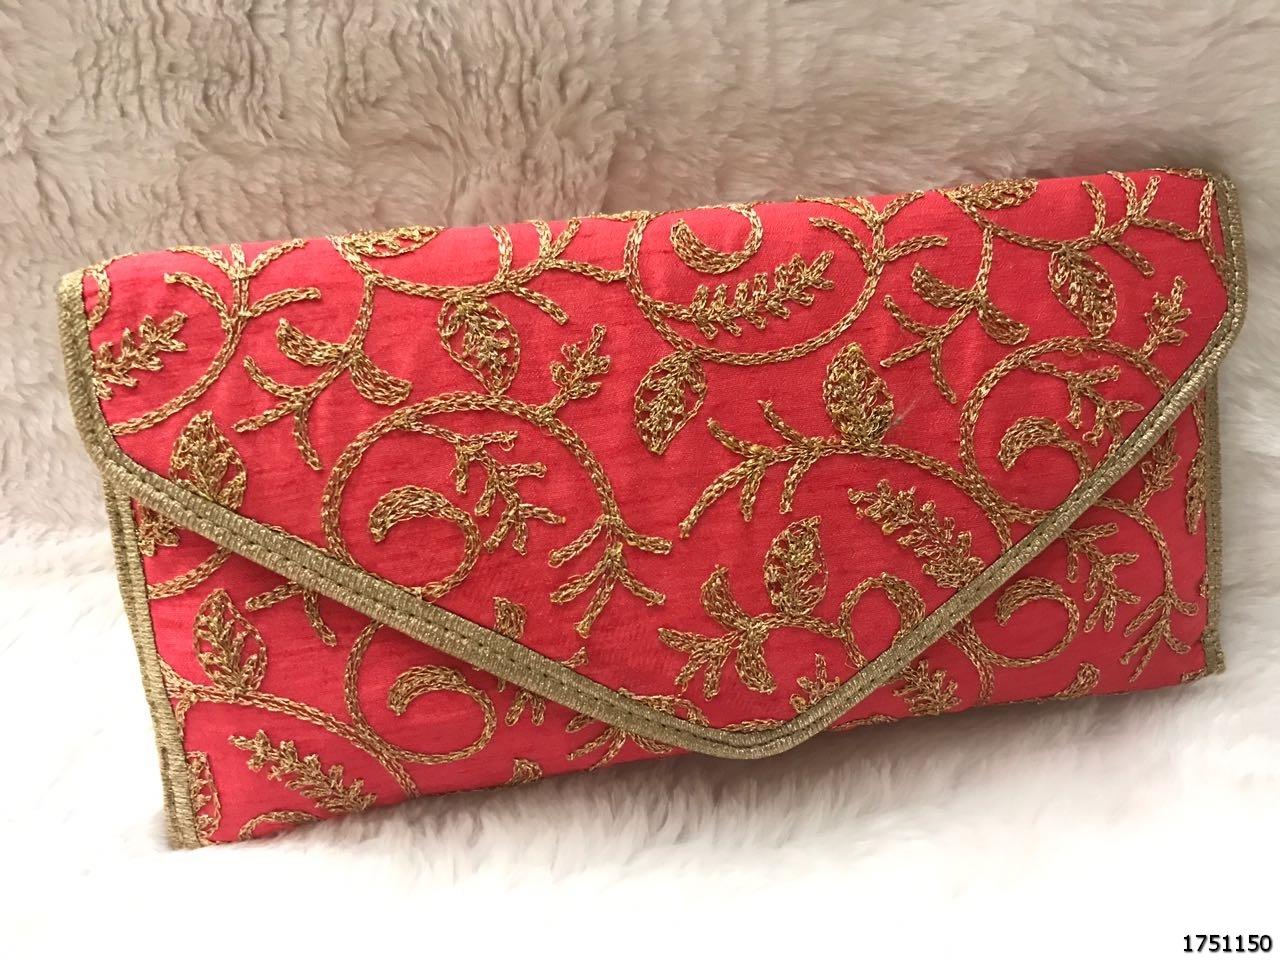 Designer Ethnic Evening Clutch Bag